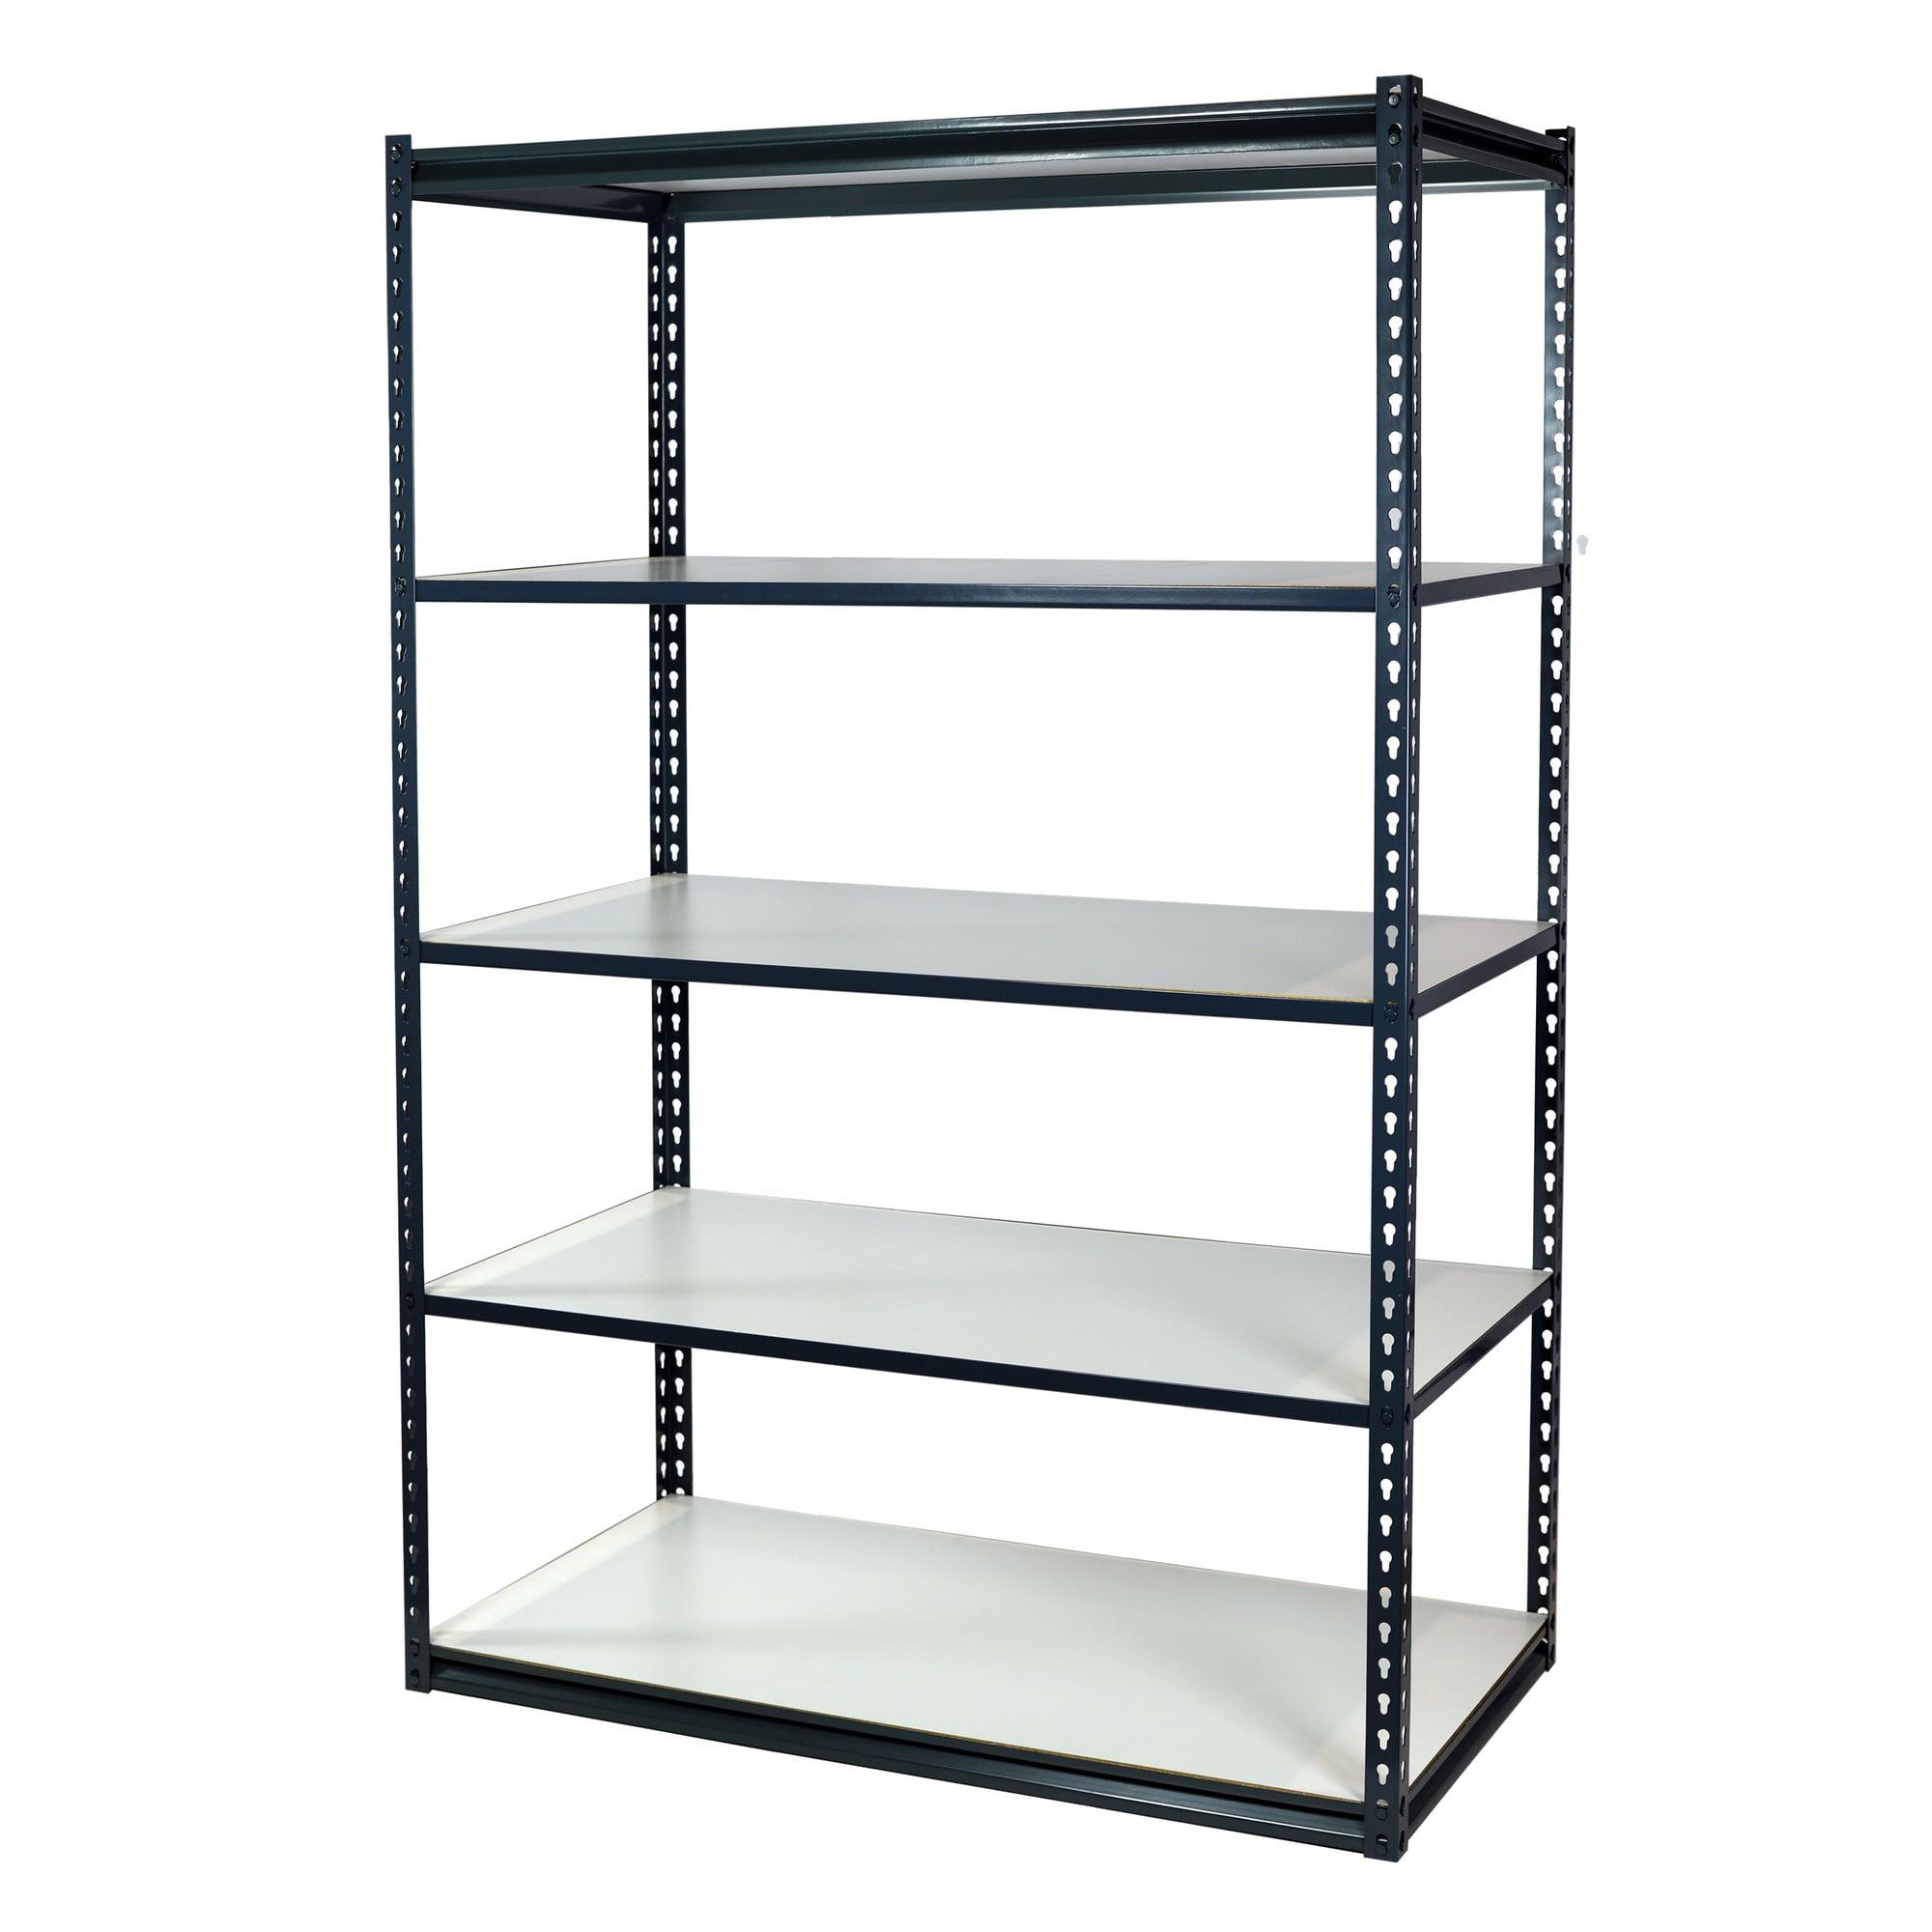 Storage Max Garage Shelving Boltless, 48 x 12 x 72, Heavy Duty, 5 Shelves